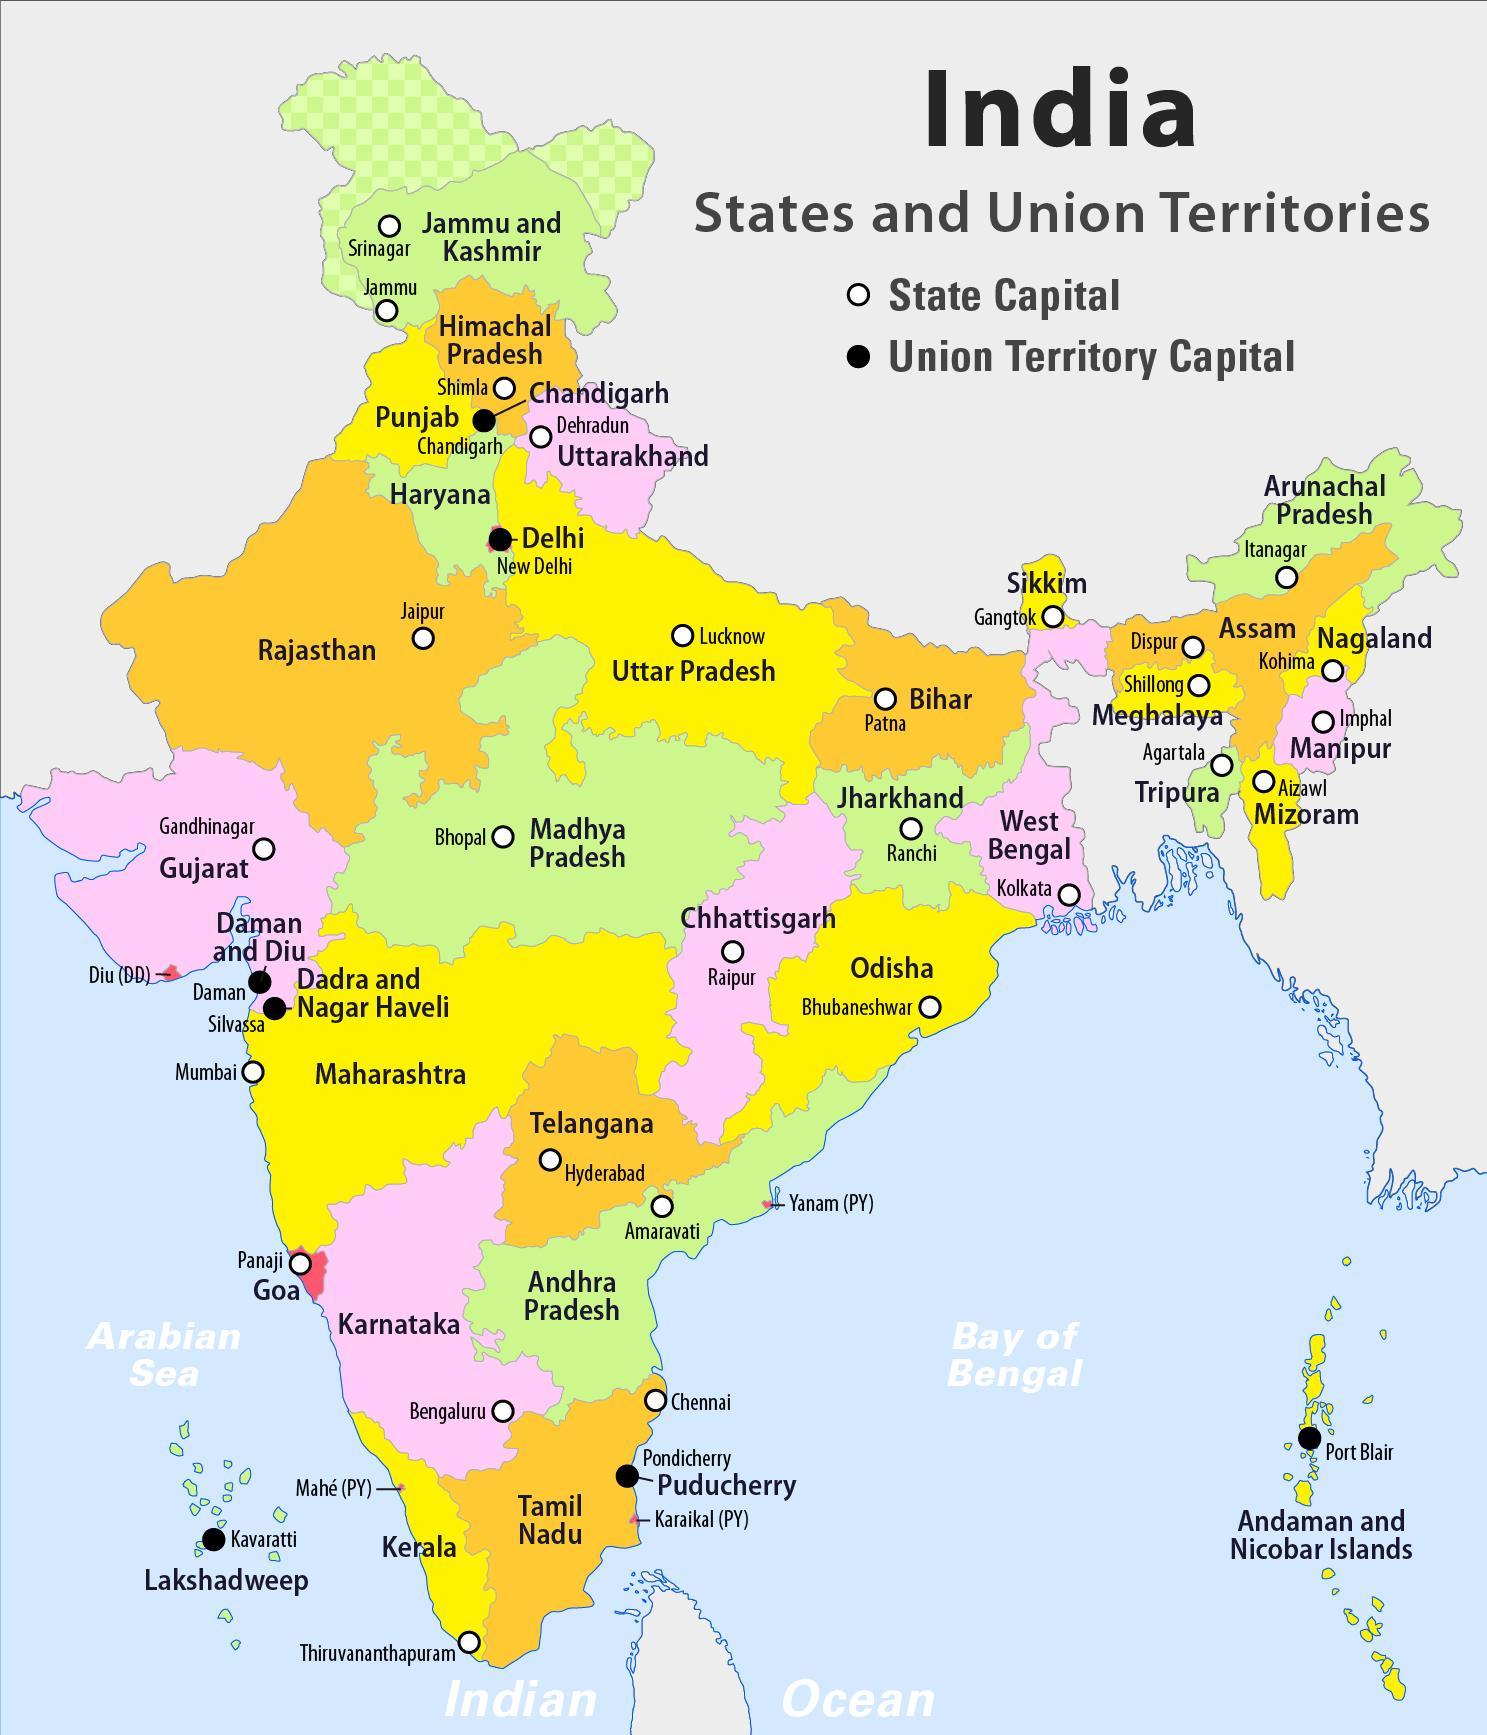 Indien Karta Med Stater Hd Hd Indien Karta Med Staterna Sodra